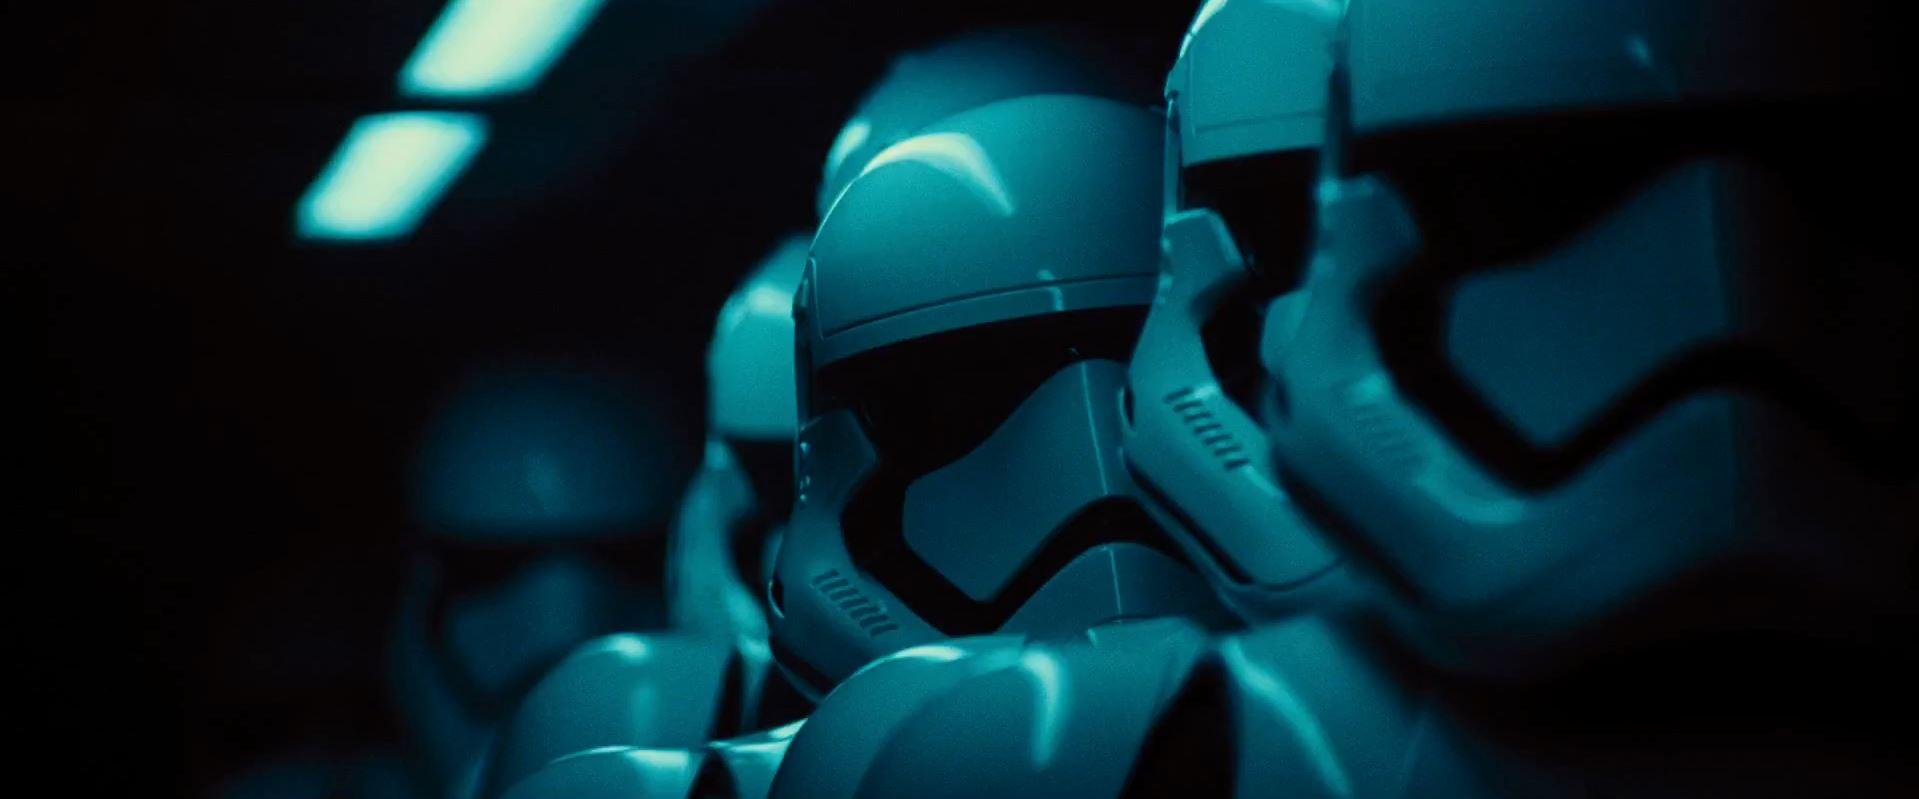 New storm troopers - Star Wars Episode 7 trailer released